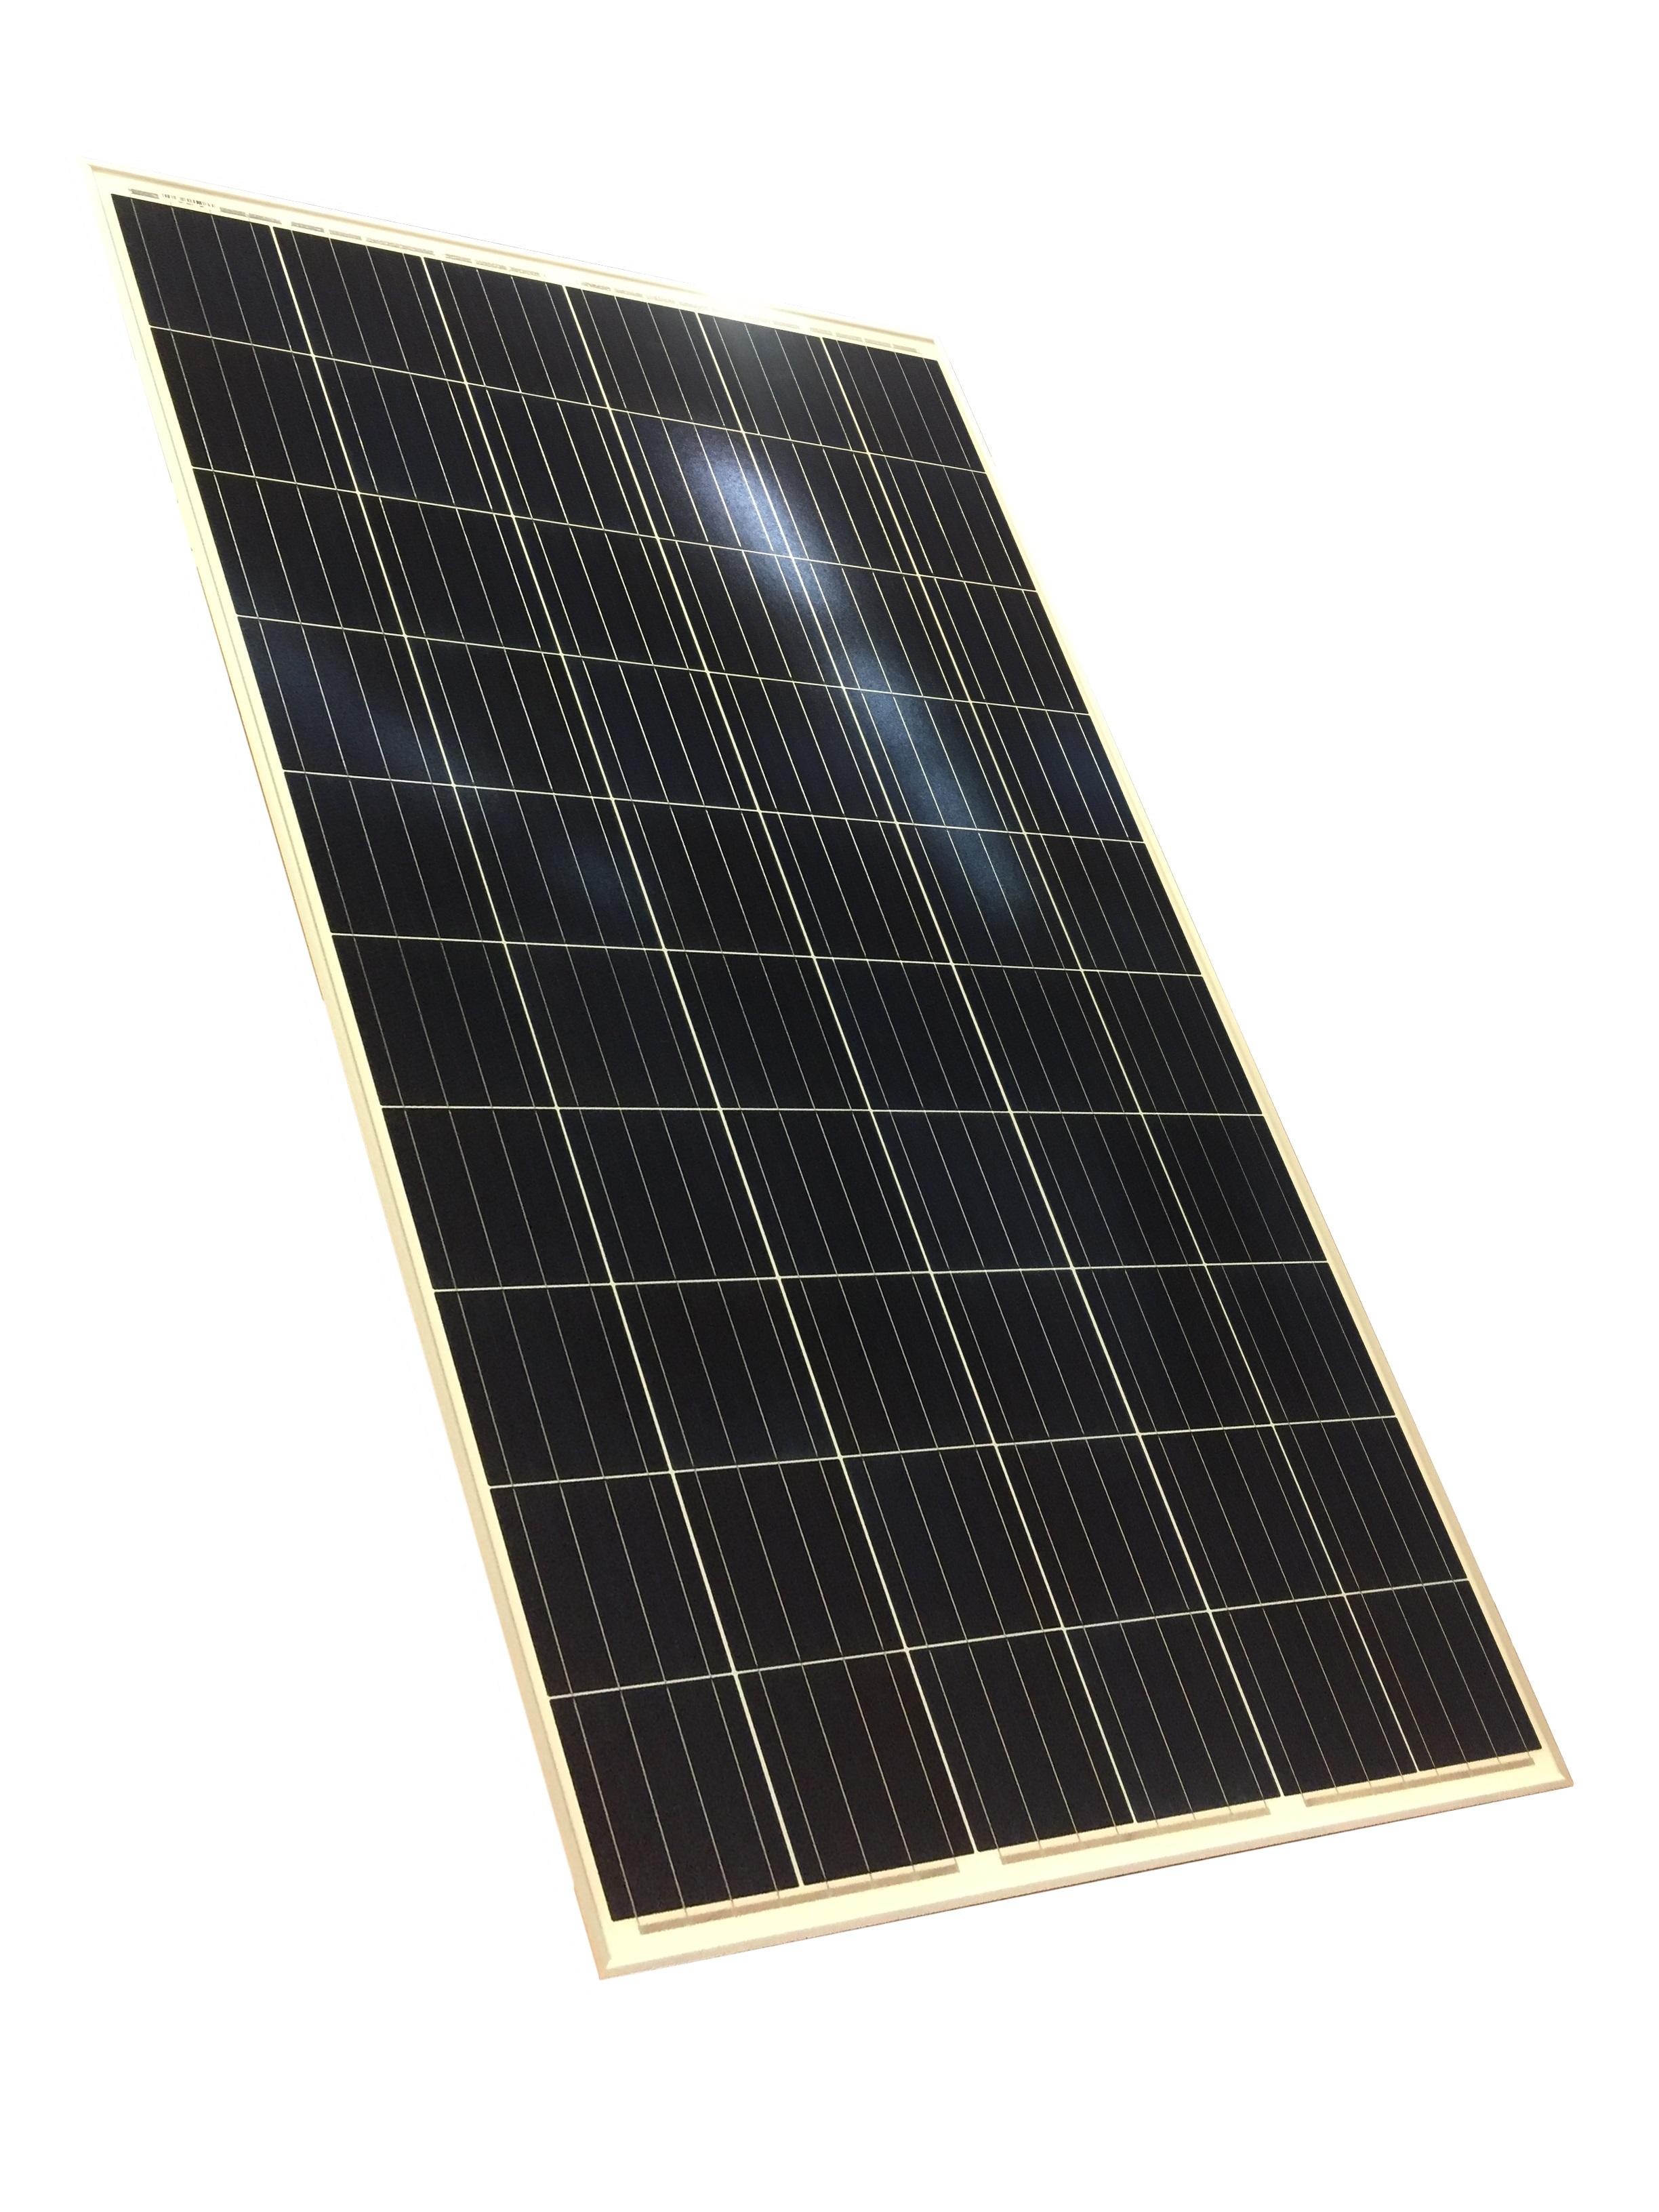 1 Stk EXE Solar A-EXP 285Wp poly IEC, 5 Busbars, 8000 Pascal PVM42850-S